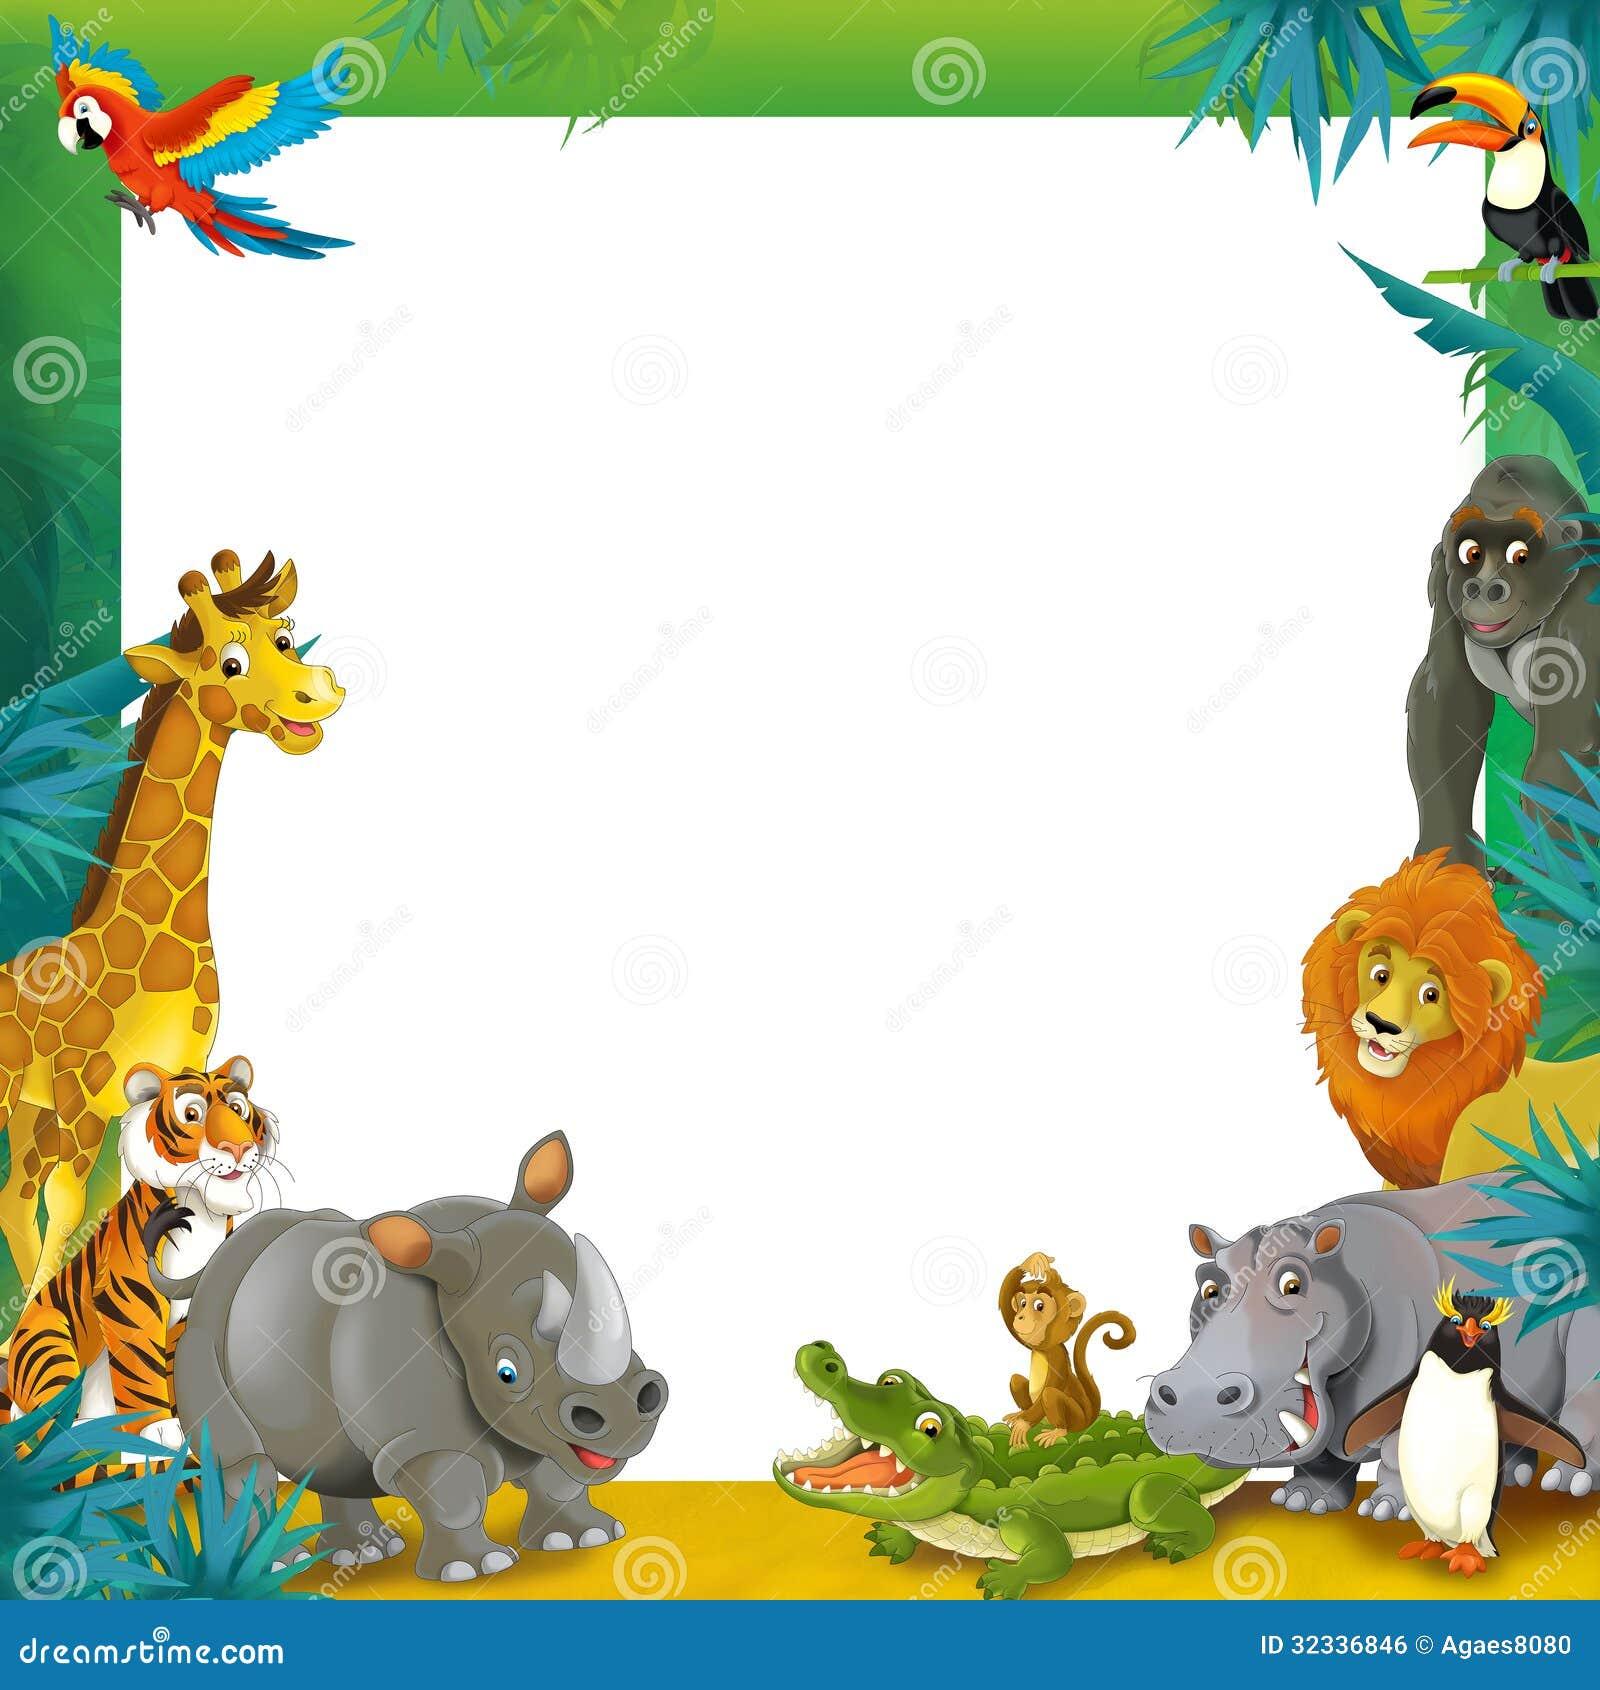 Jungle Animal Template